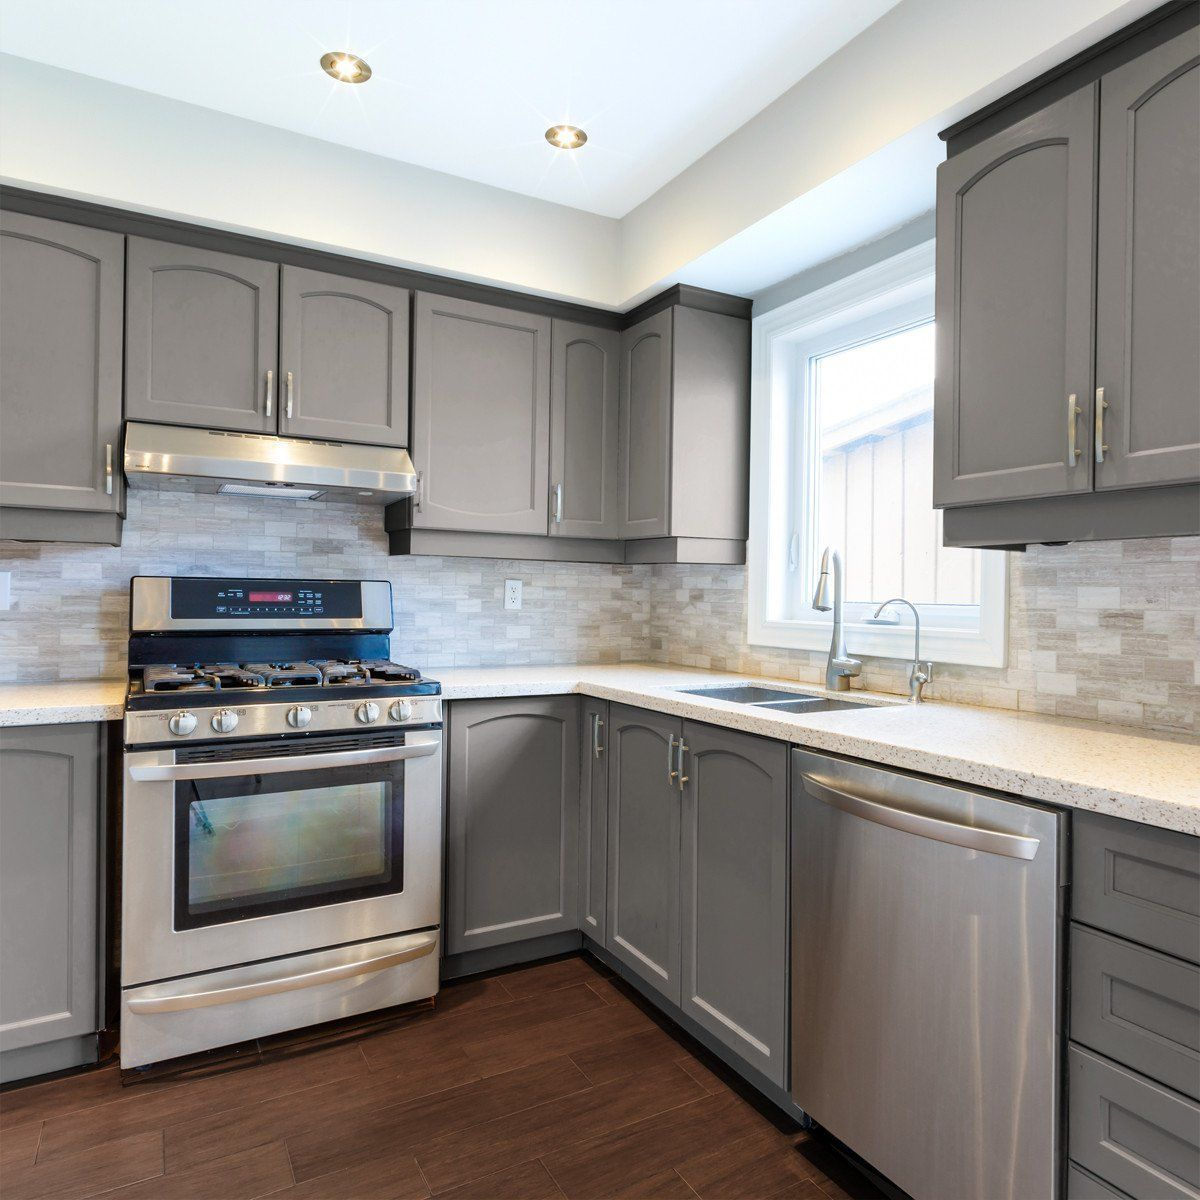 Nuvo Hearthstone Cabinet Paint Kit In 2020 Kitchen Cabinet Remodel Kitchen Layout Interior Design Kitchen